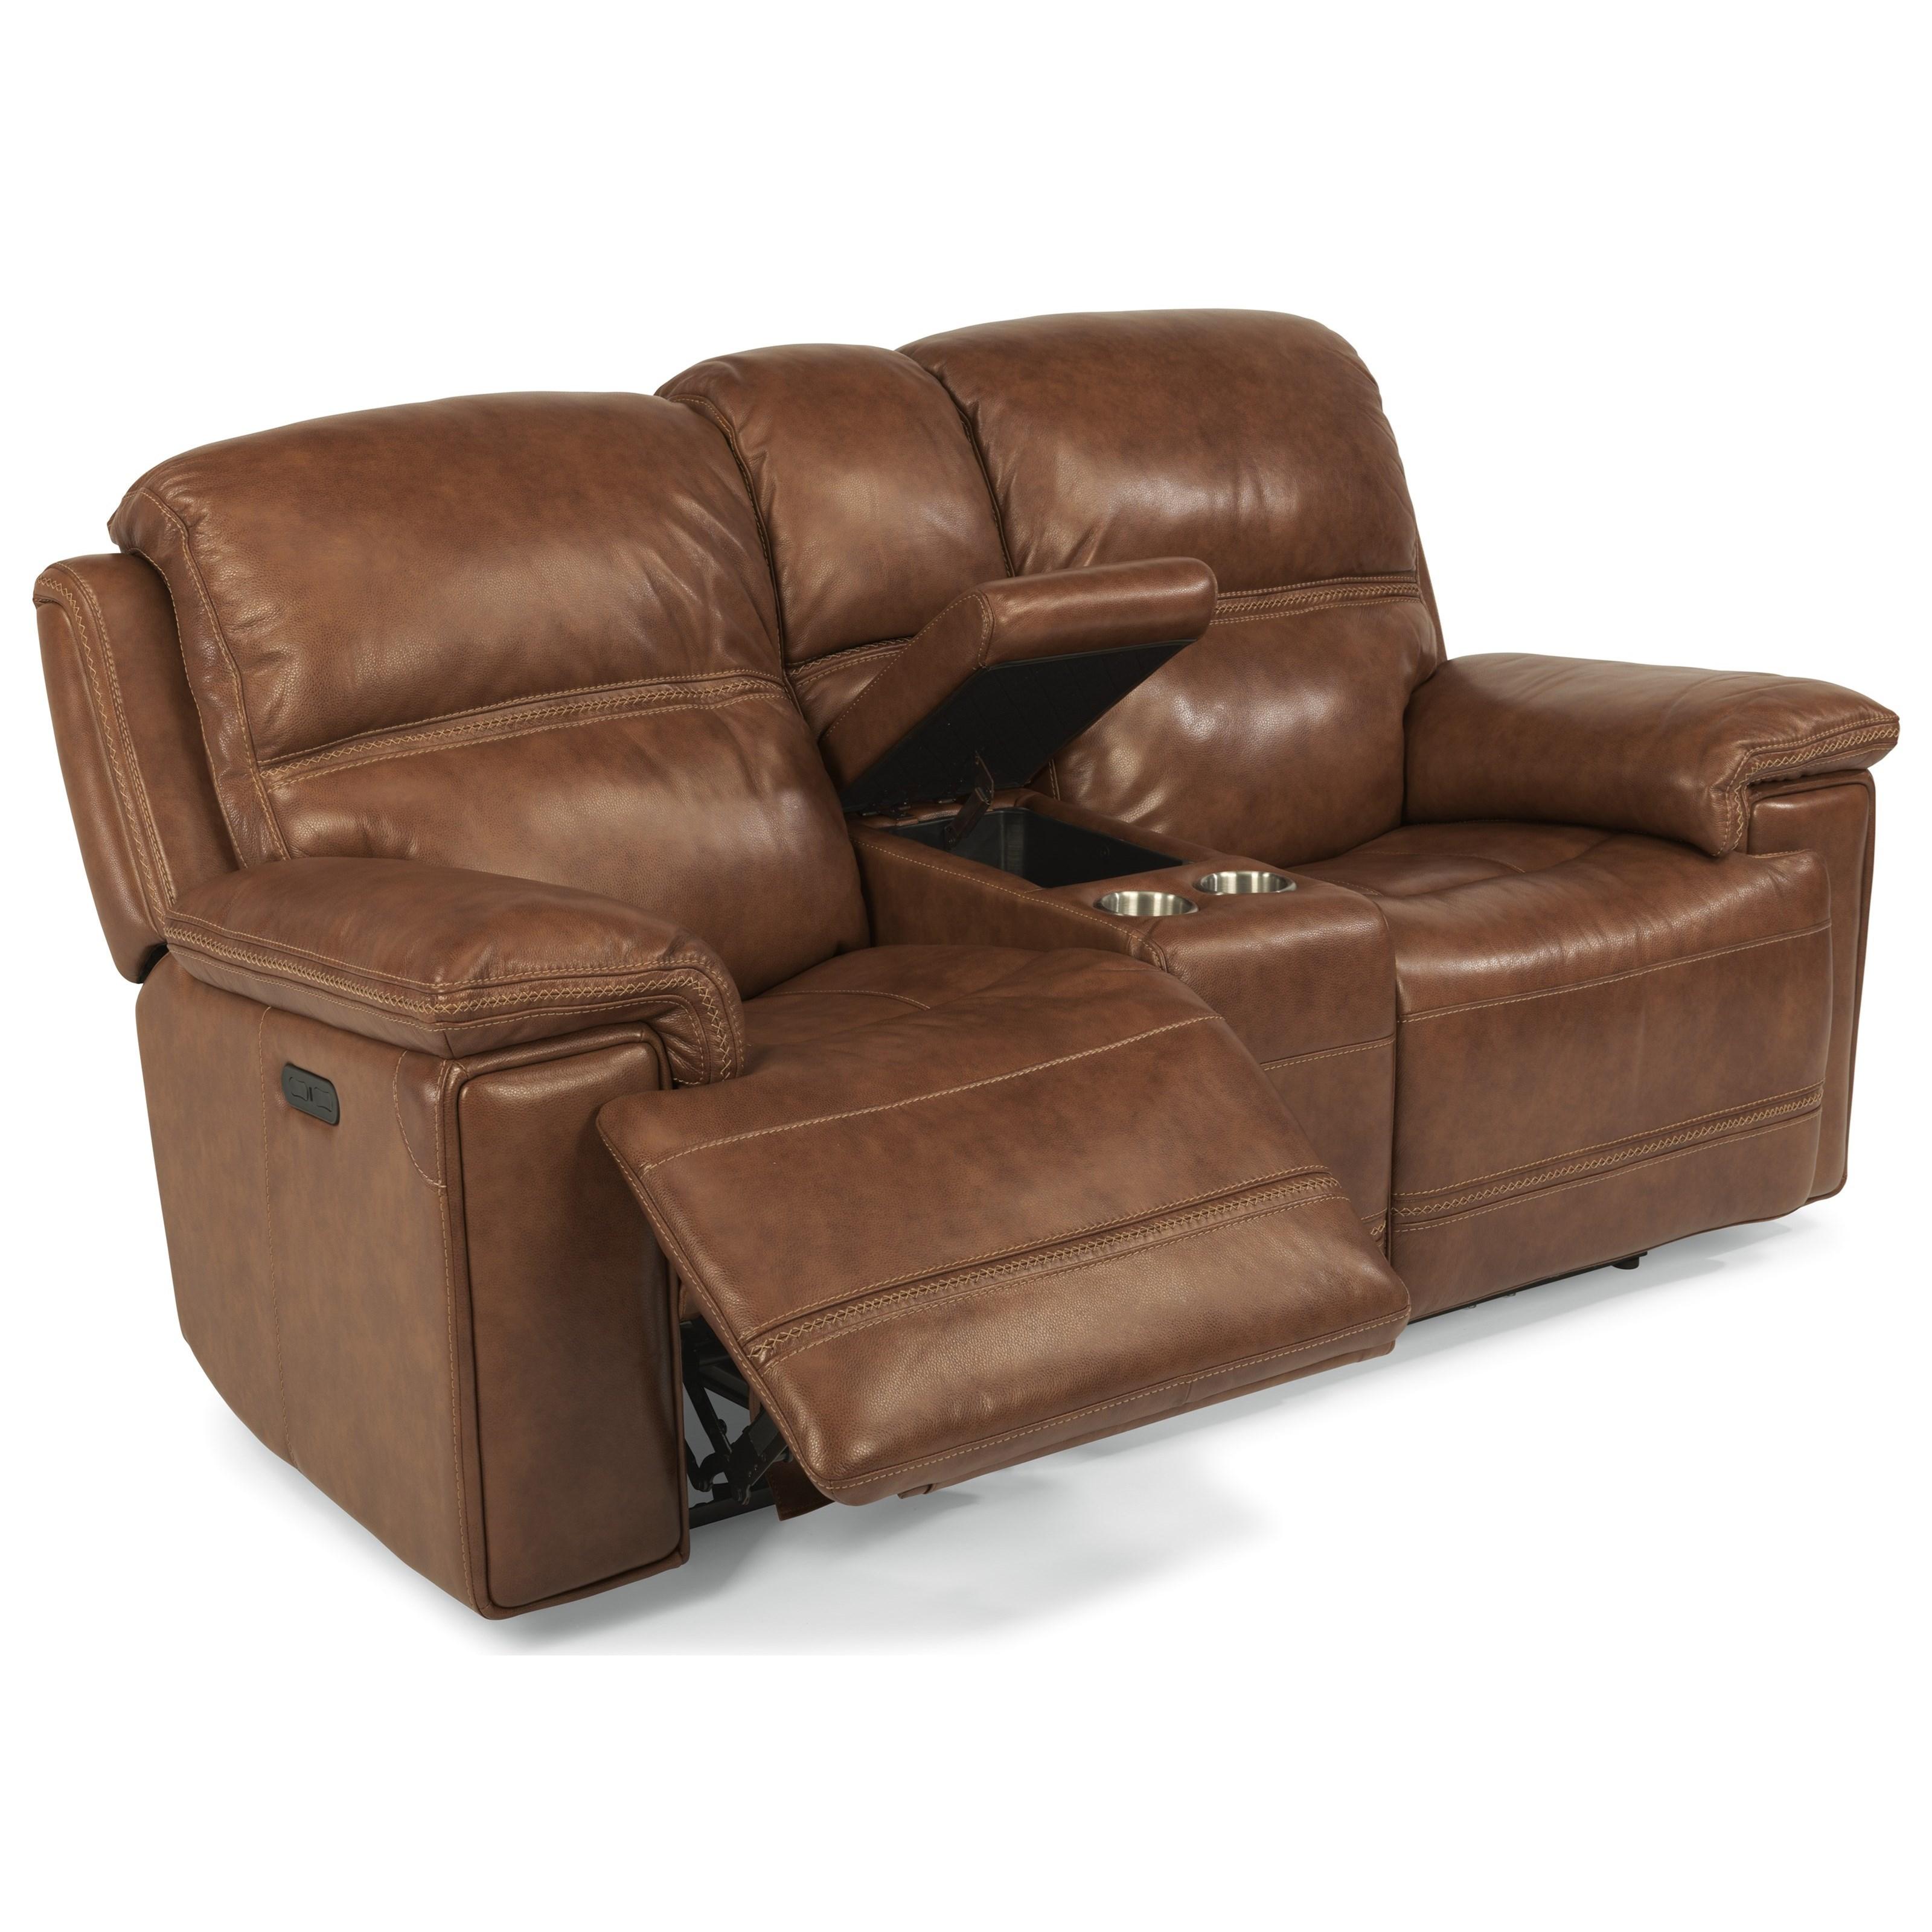 Latitudes-Fenwick Pwr Rcl LS w/ Cnsl & Pwr Hdrst by Flexsteel at Fashion Furniture